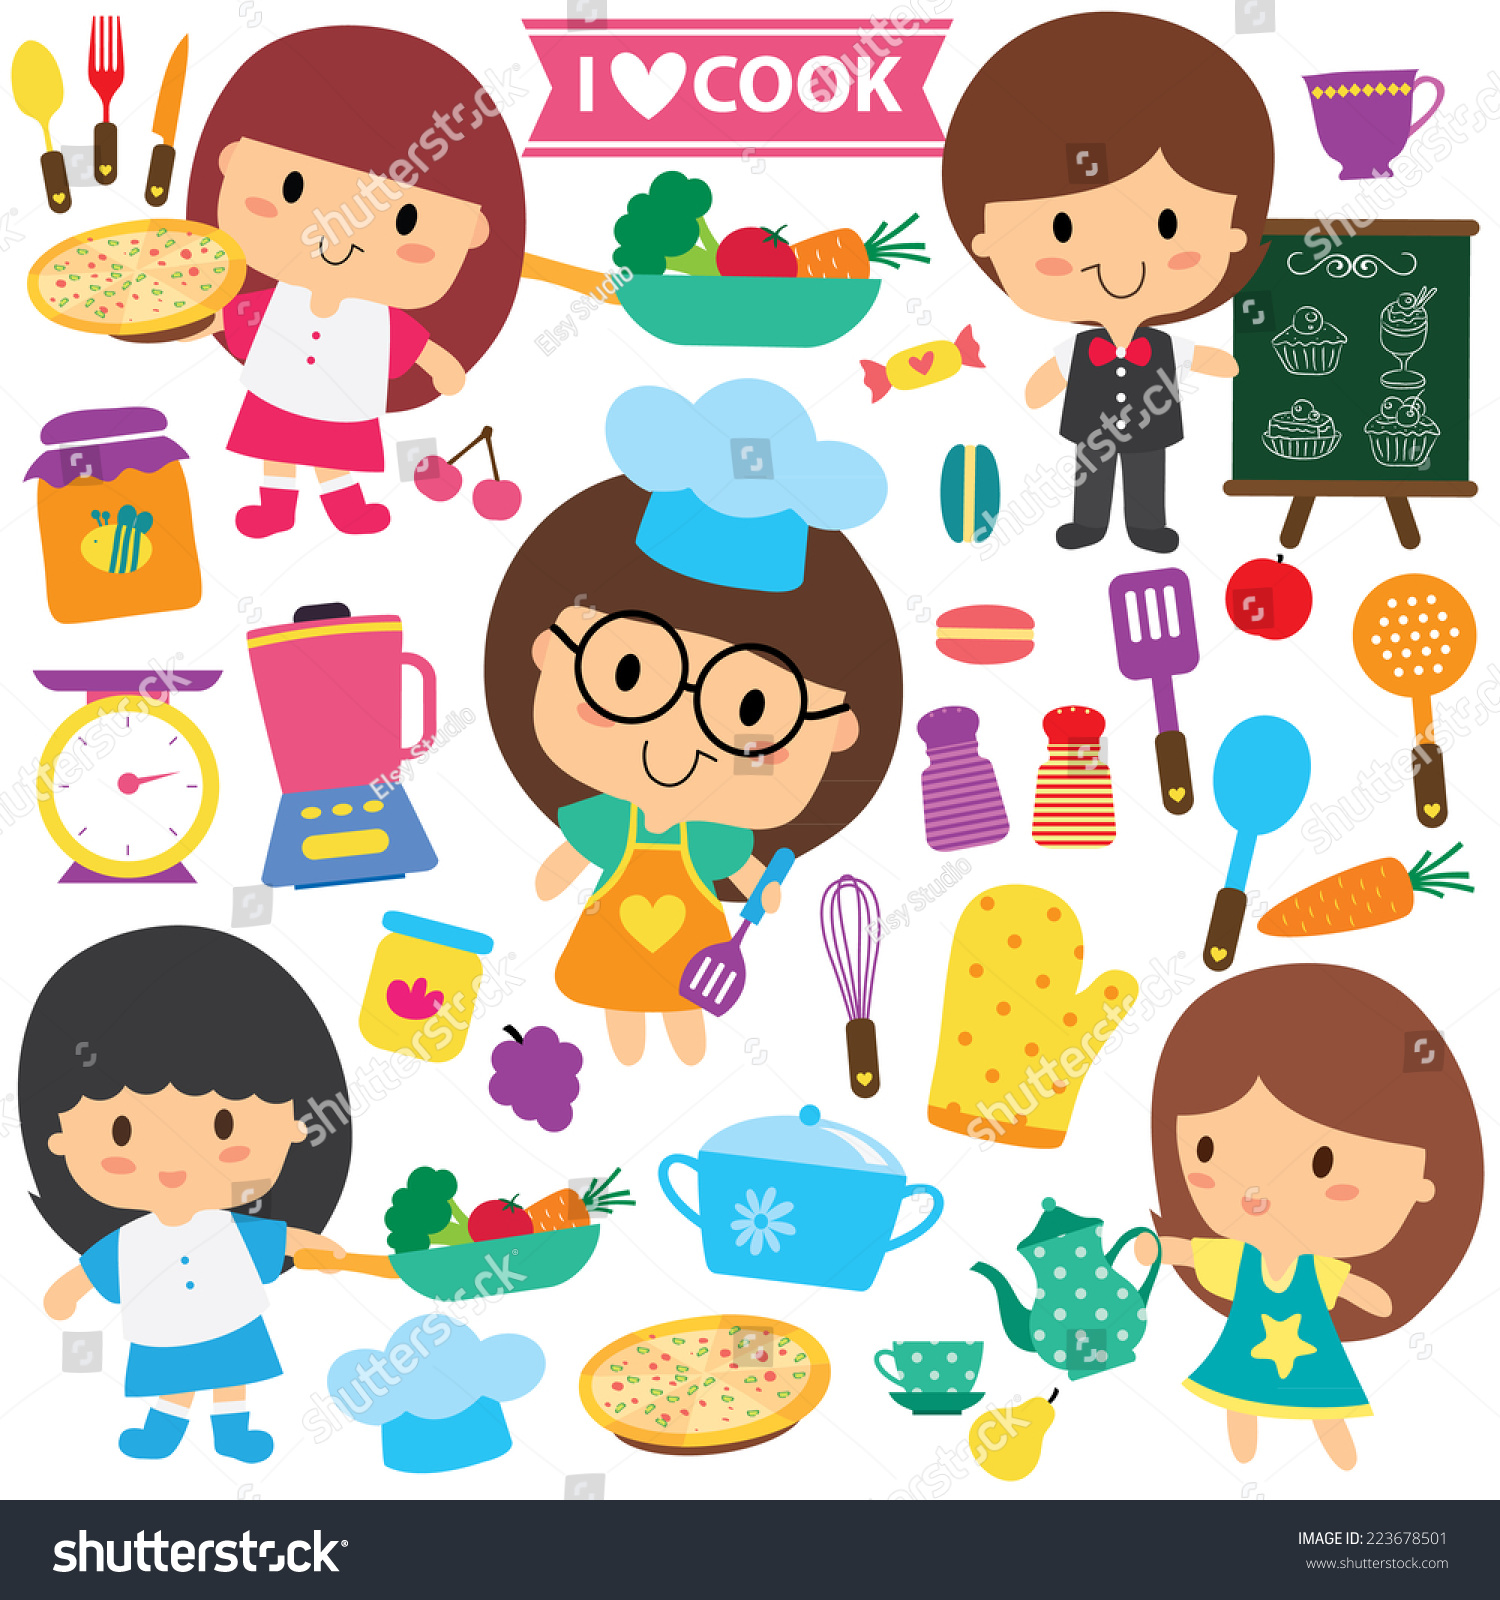 Play kitchen clip art - Chef Kids And Kitchen Elements Clip Art Set